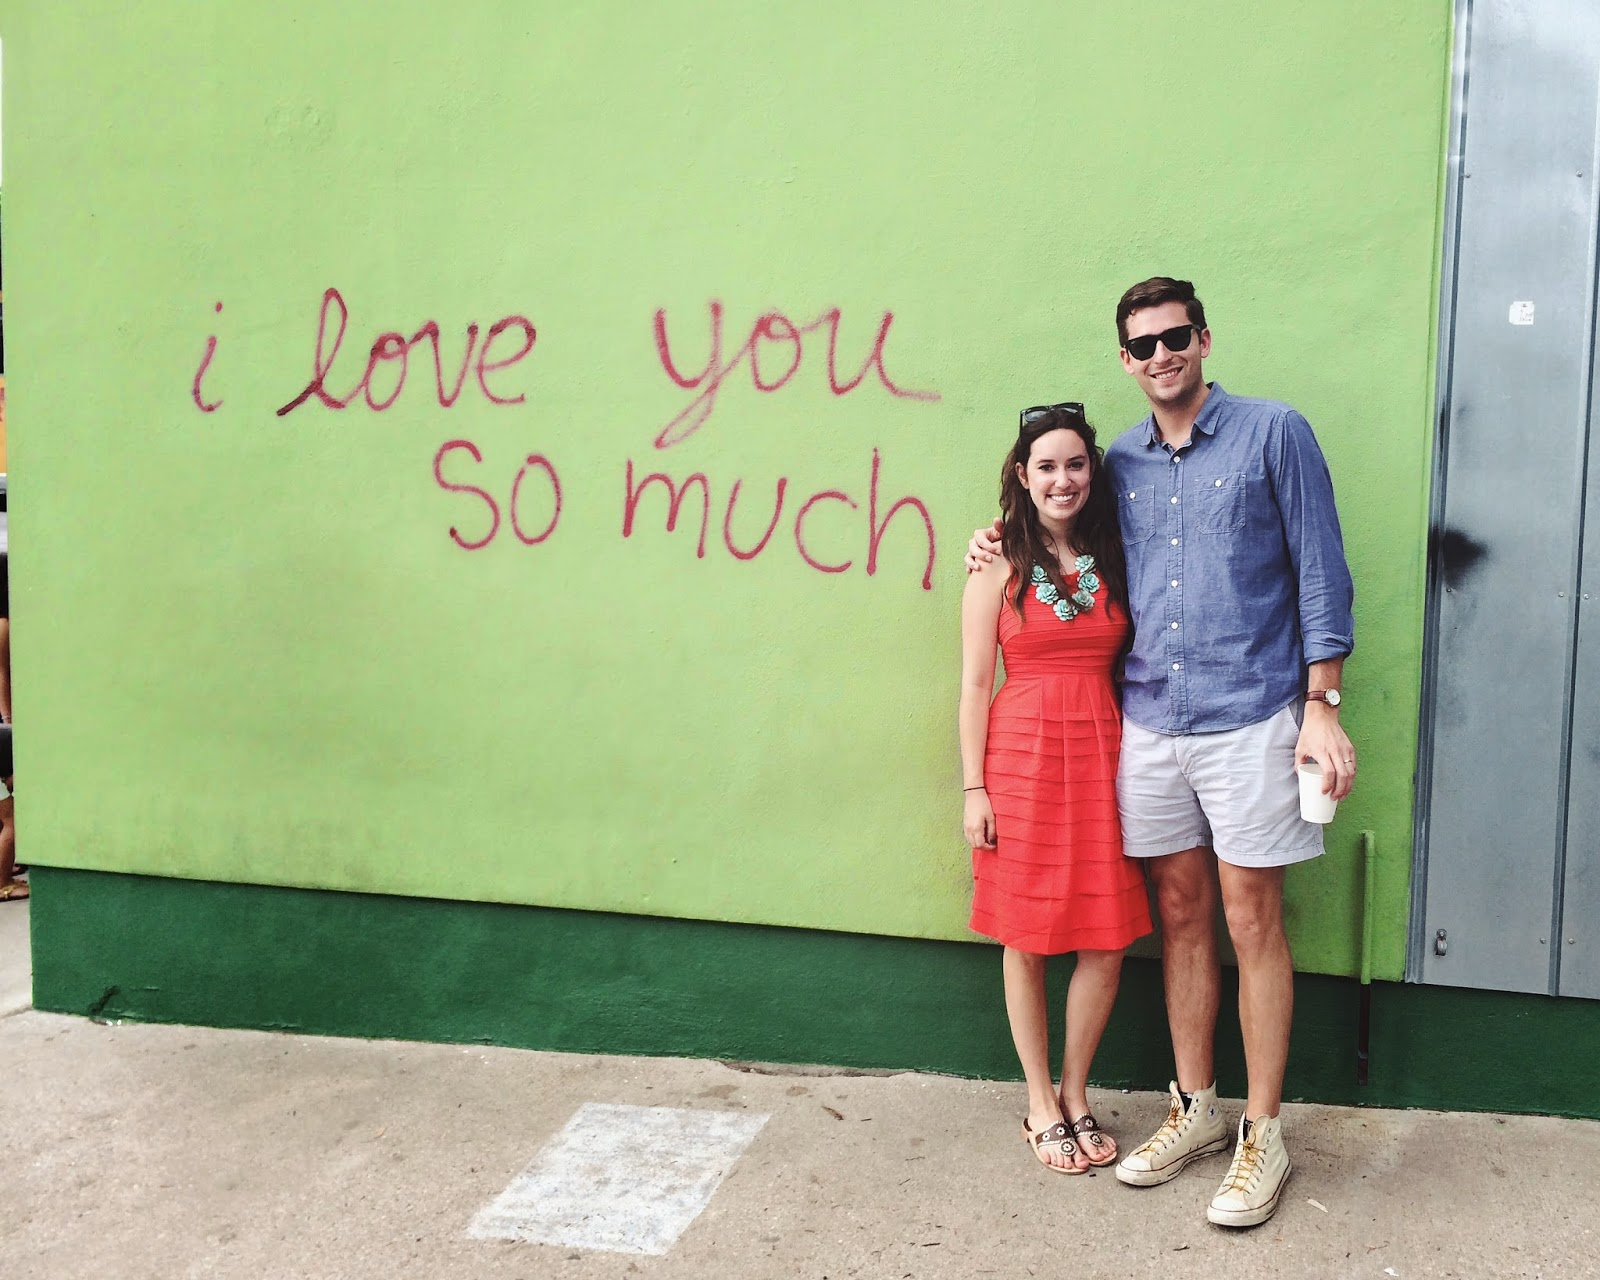 Jo's Coffee, Jo's Coffee Austin, I Love You So Much Austin TX, Tangelo Dress Anthropologie, Tangelo Dress Blog Anthropologie, Tangelo Dress, Trendy in Texas, Trendy in Texas Blog